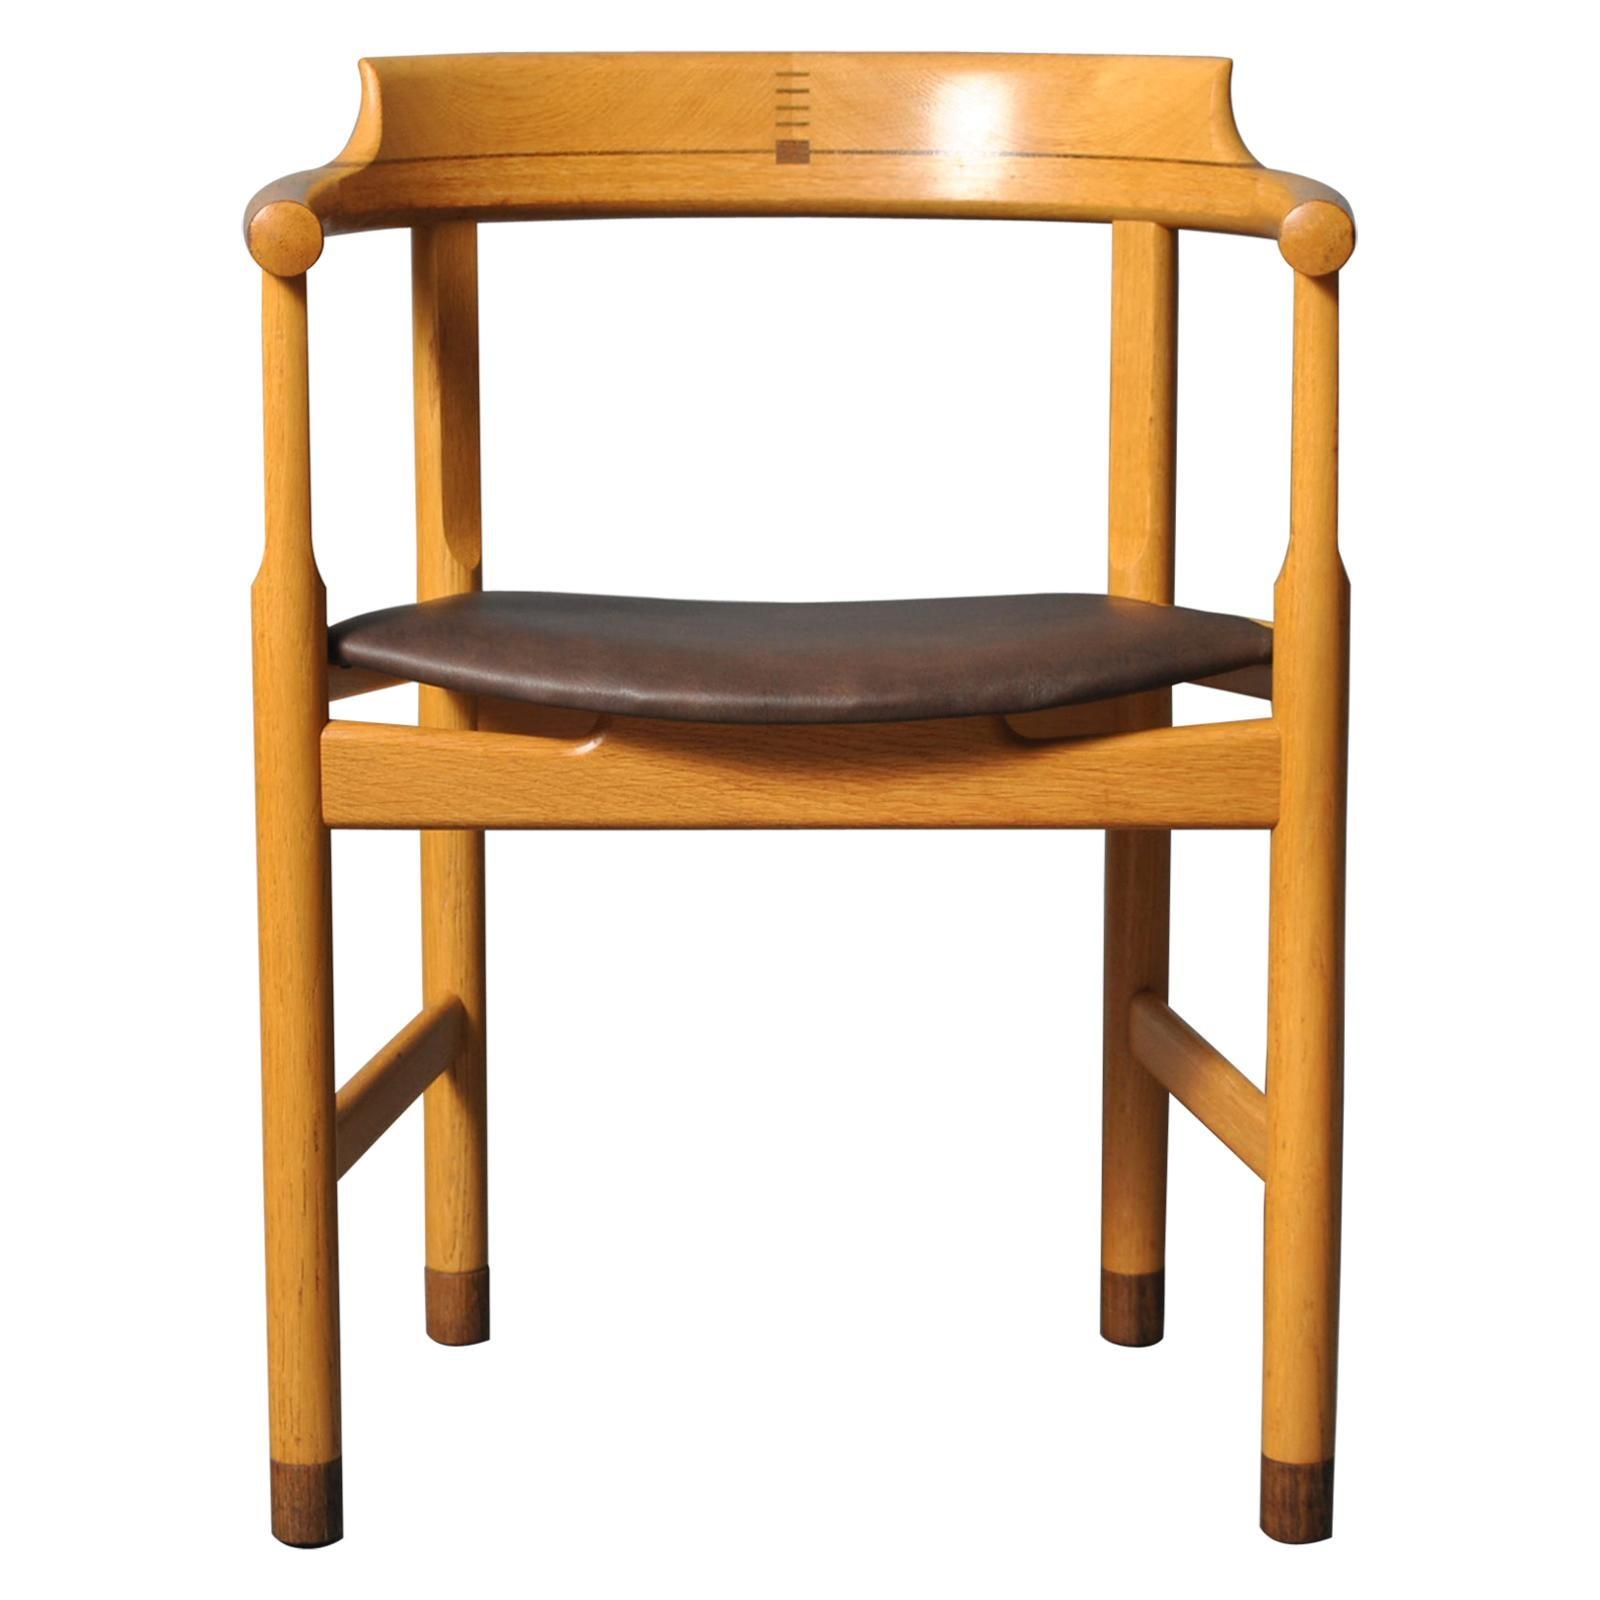 Original Hans J Wegner PP52 Chair